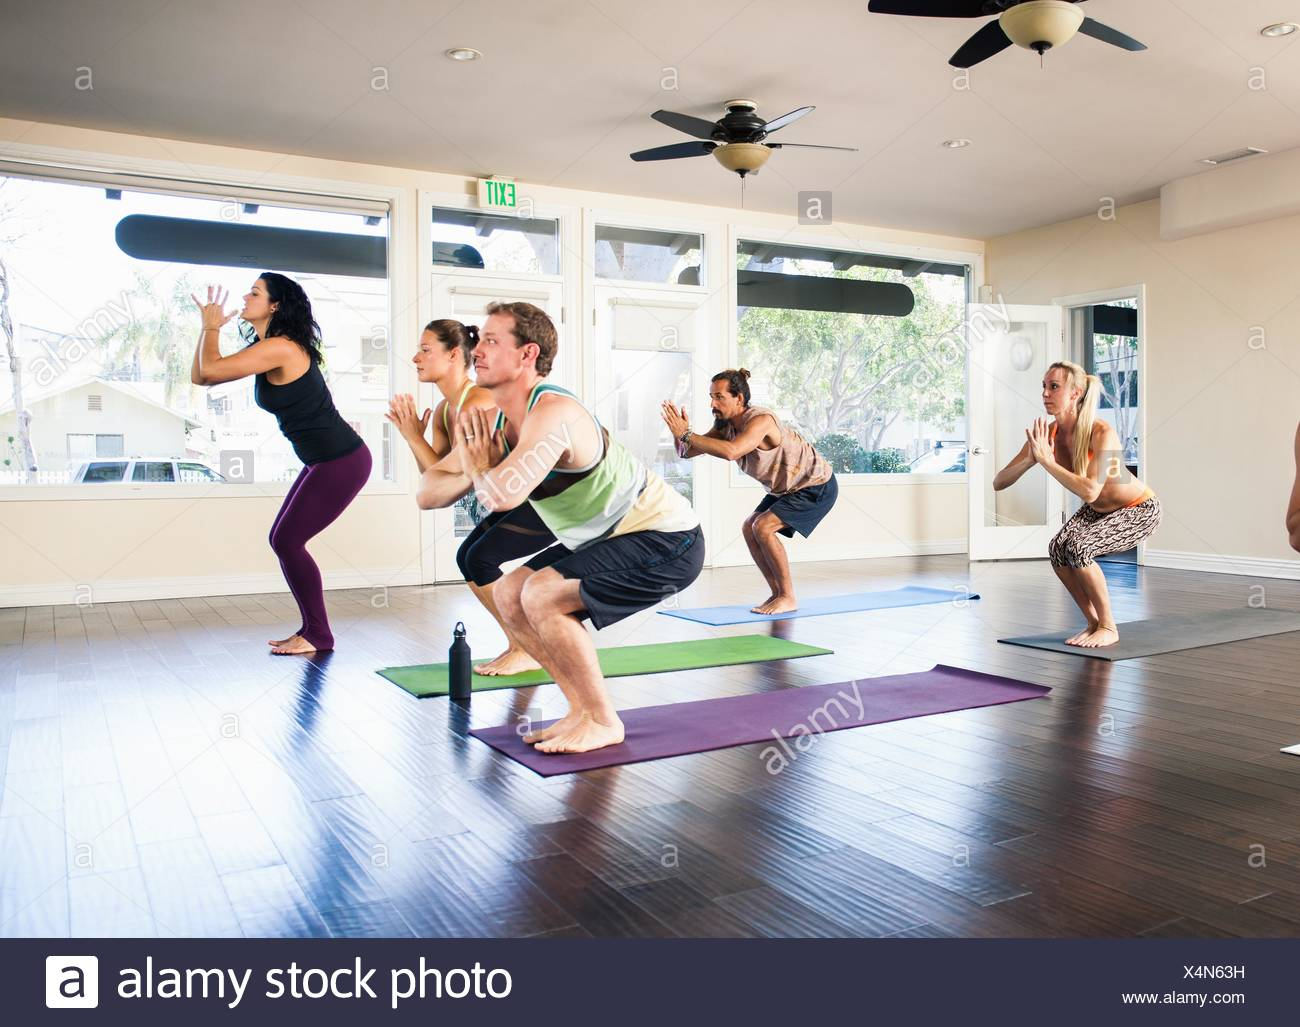 Five people in yoga class Stock Photo